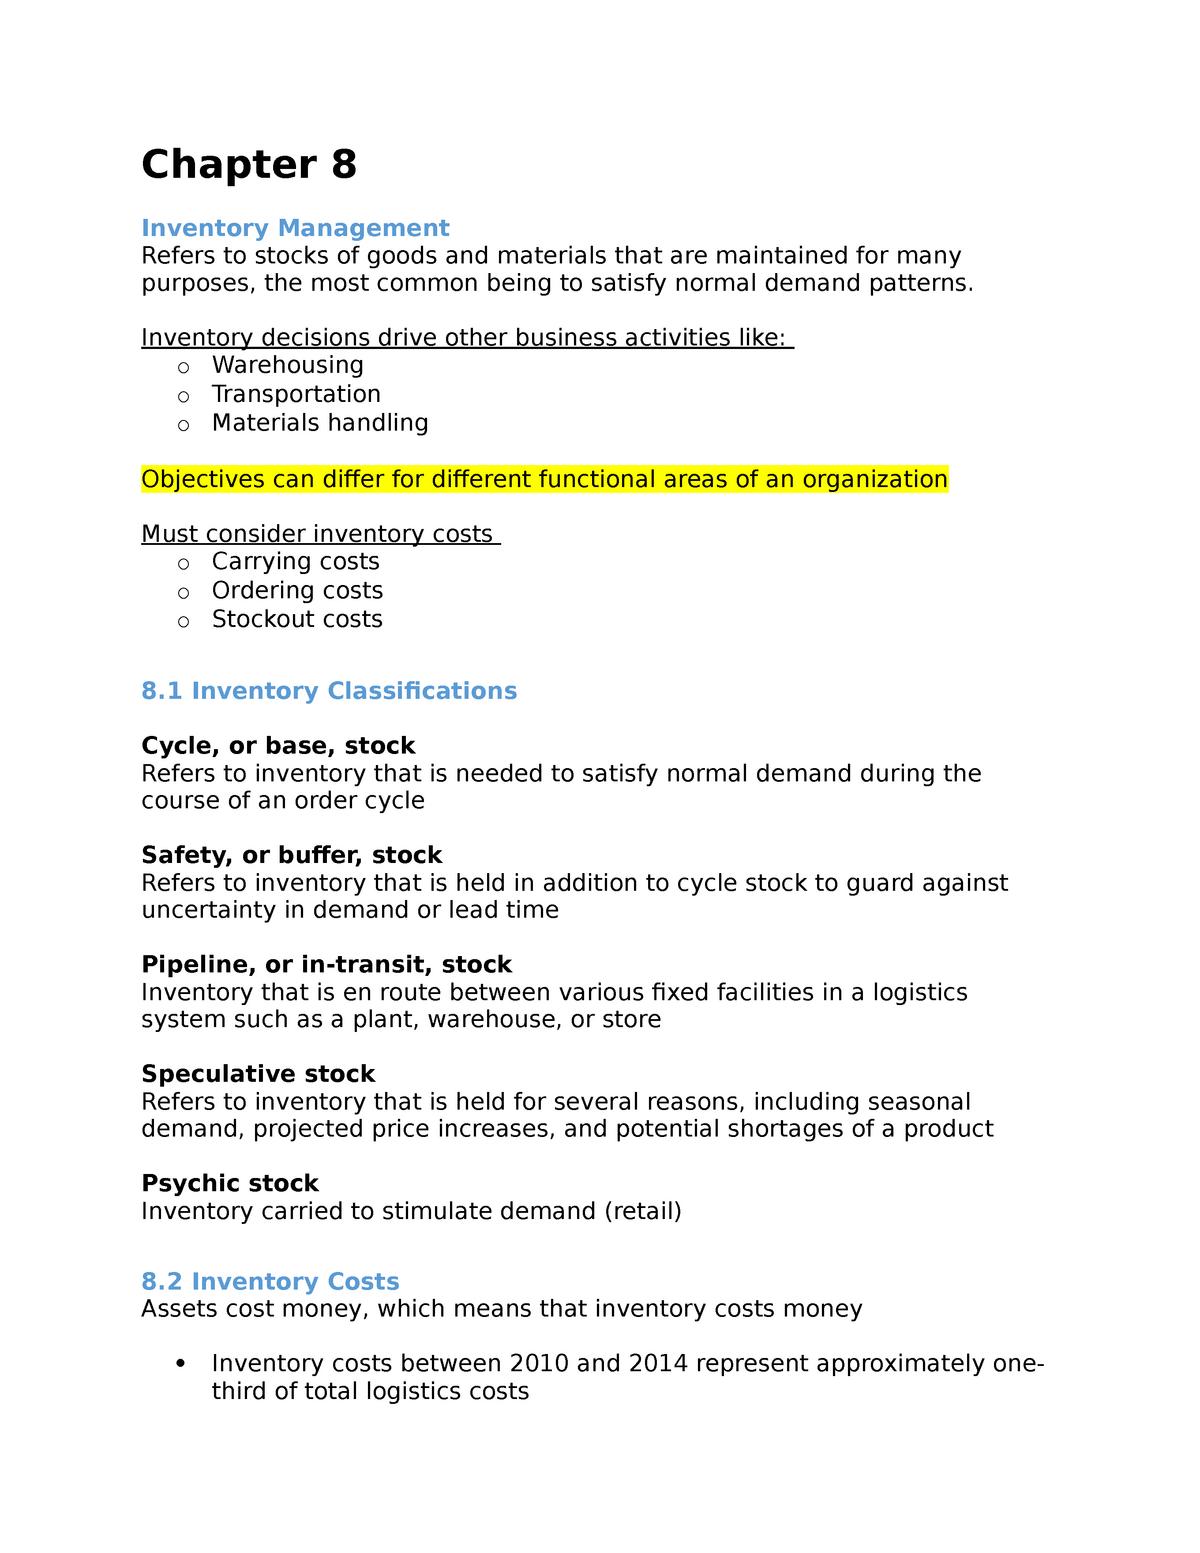 Chapter 8 - Lecture notes 4 - SCMT 310: Logistics I - StuDocu